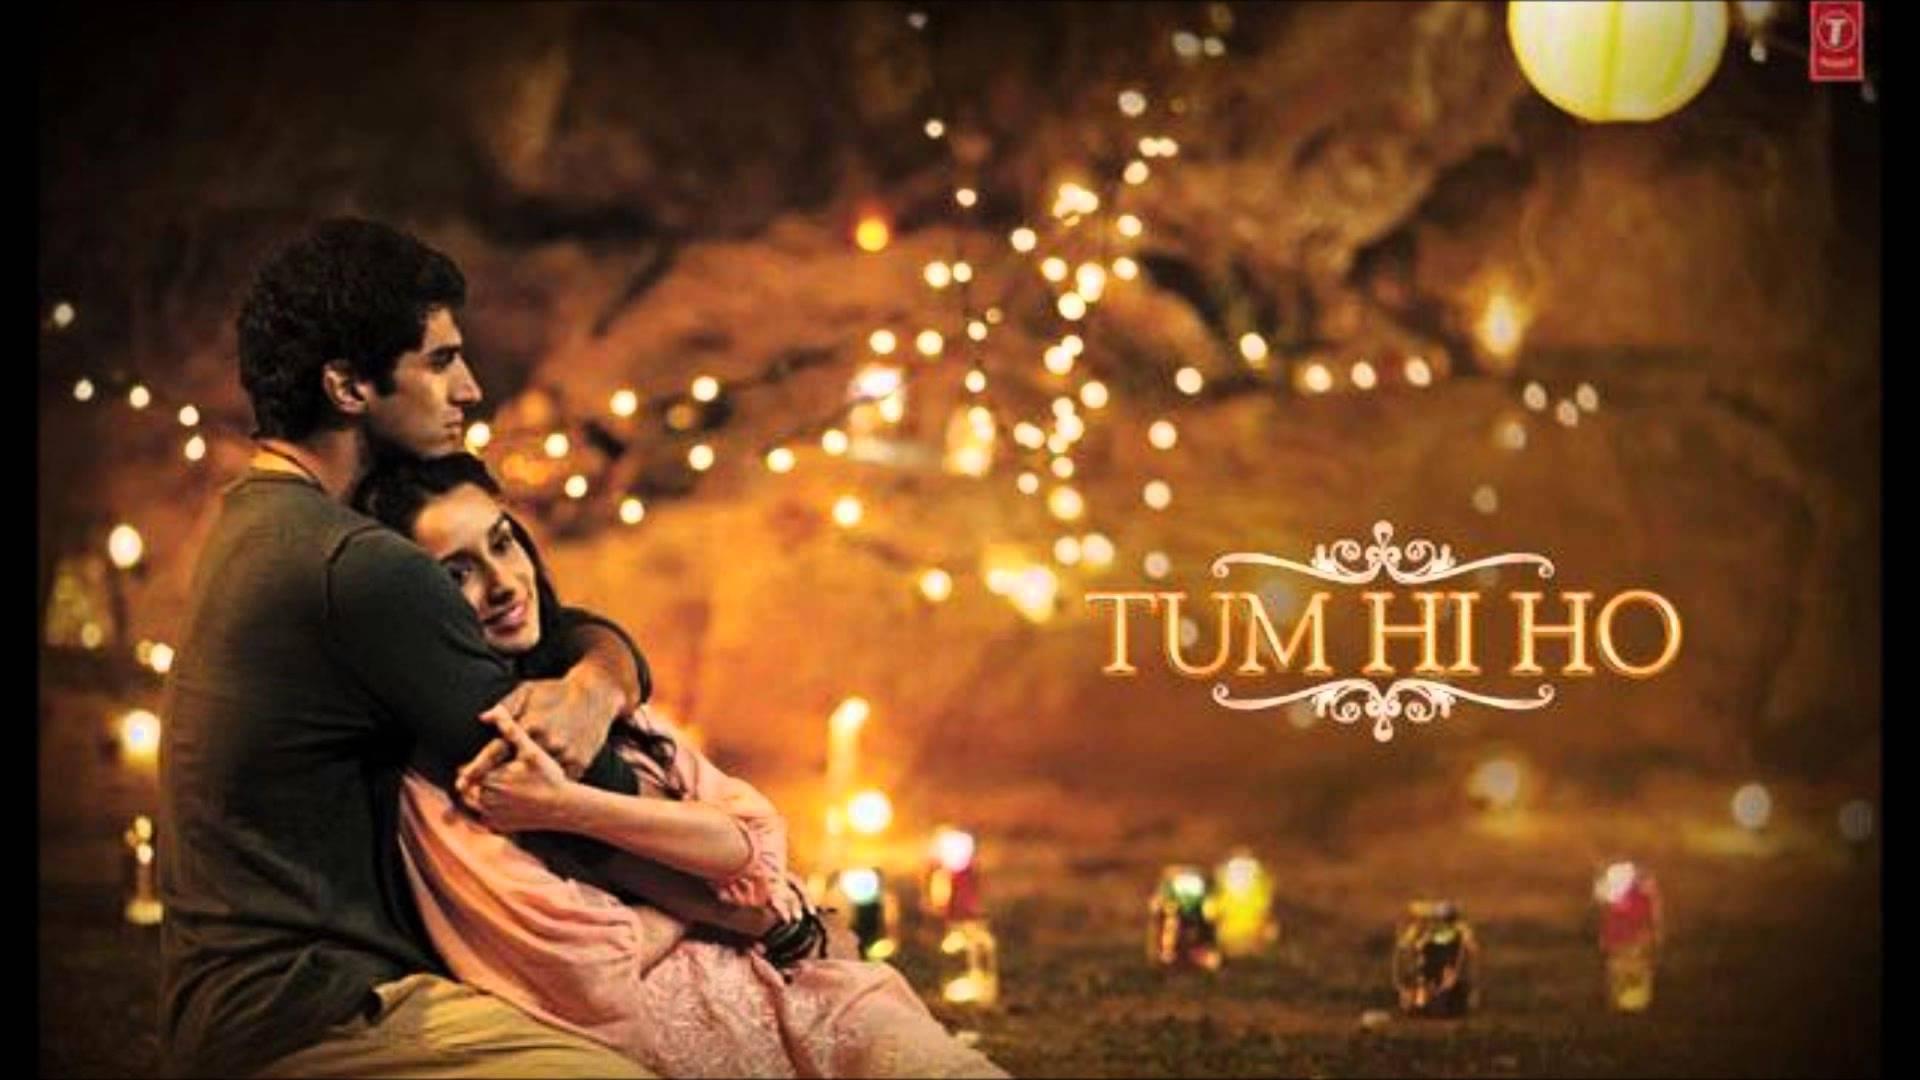 TumHiHo